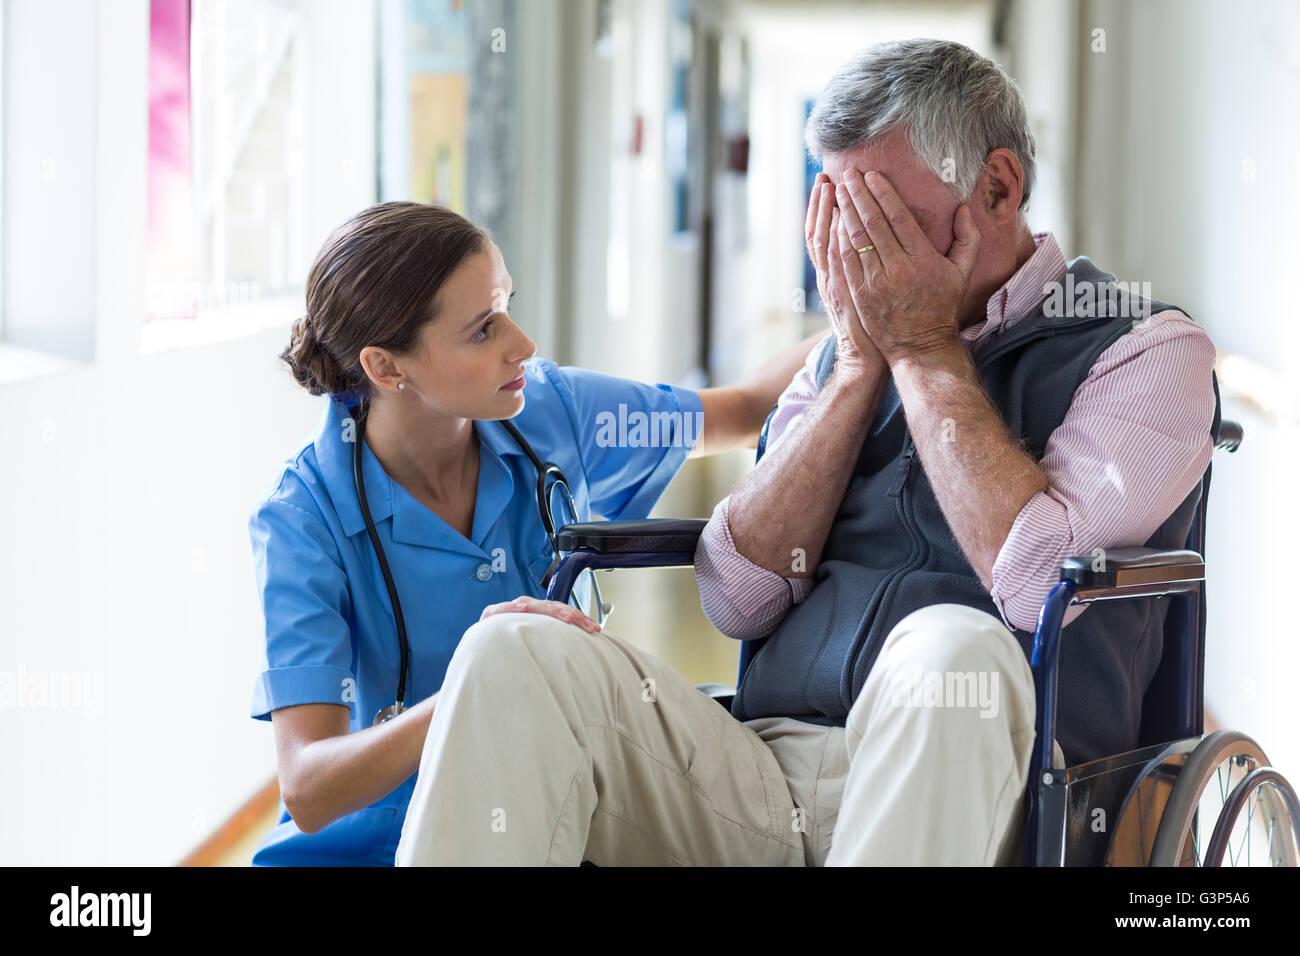 Female doctor consoling senior man in corridor - Stock Image